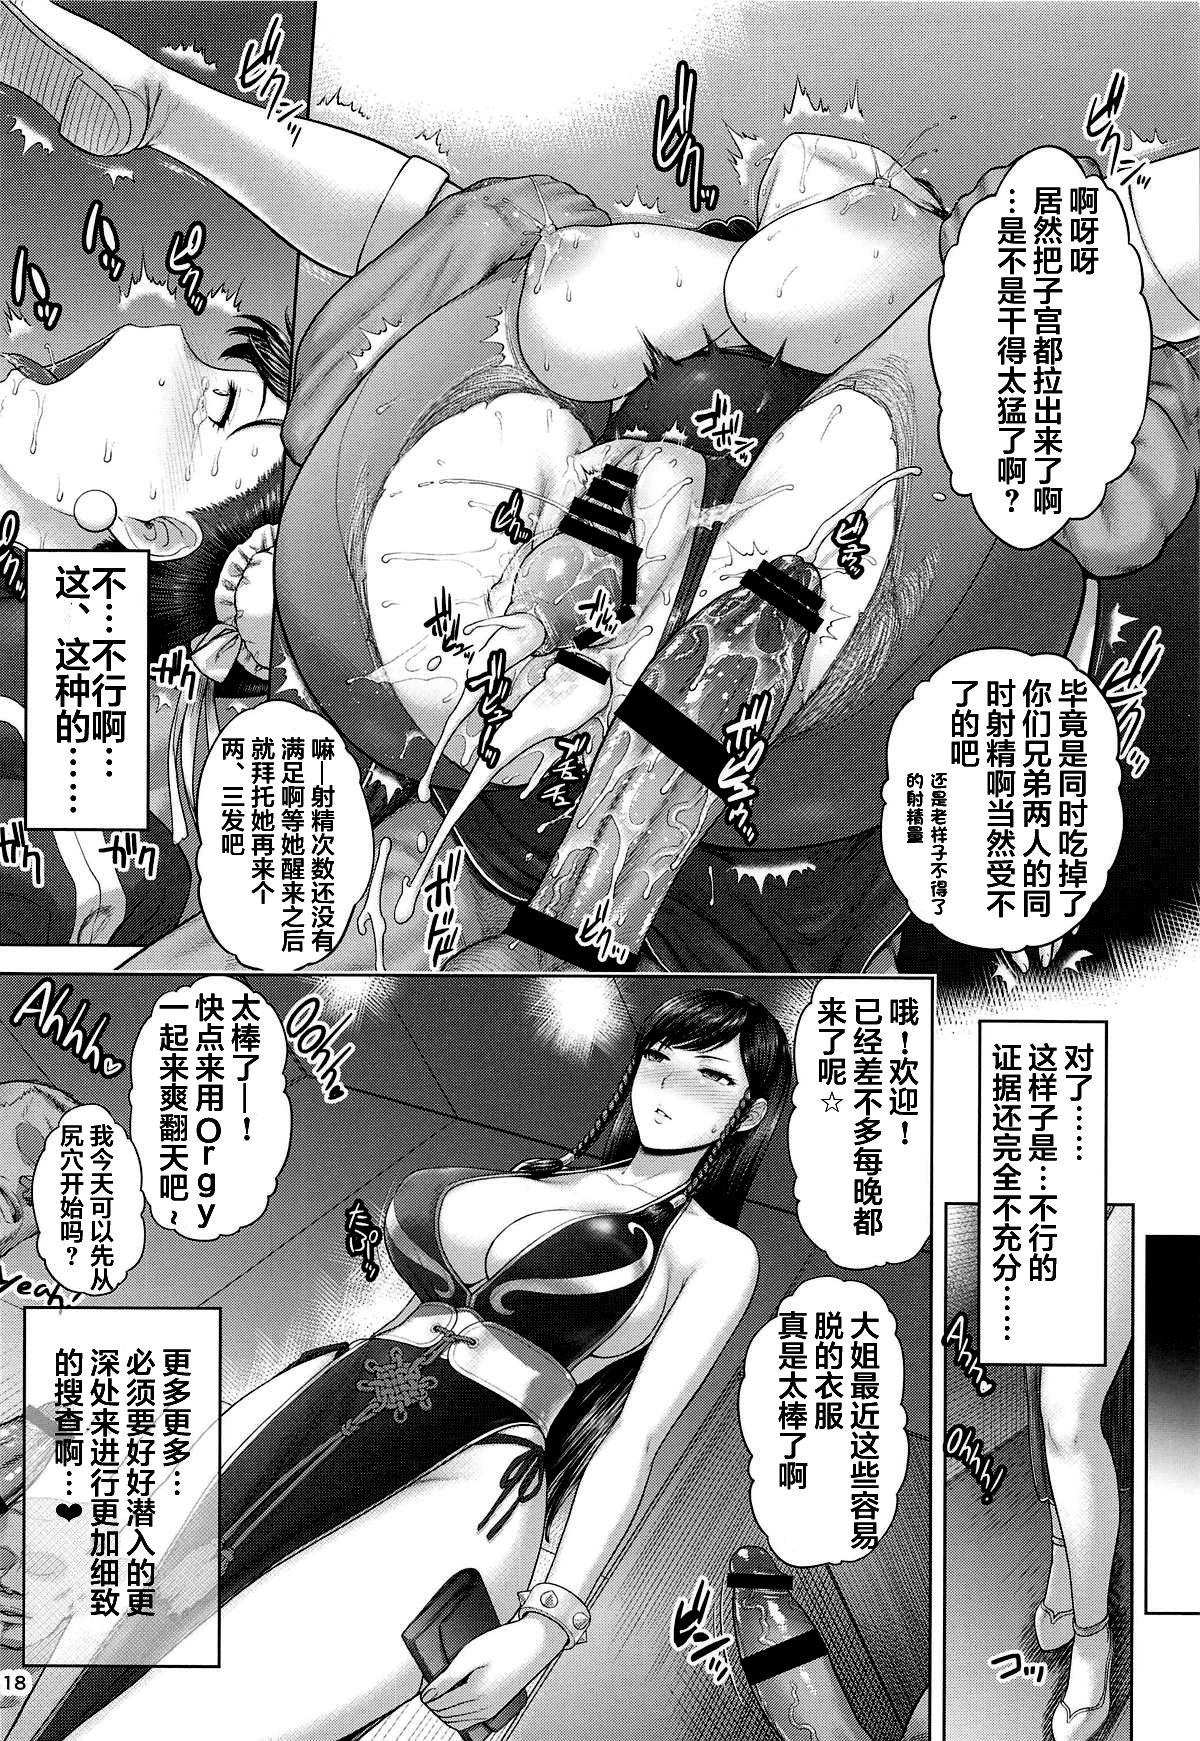 Chun-Li Sousakan Sennyuu Sousa Kiroku Gekan 16